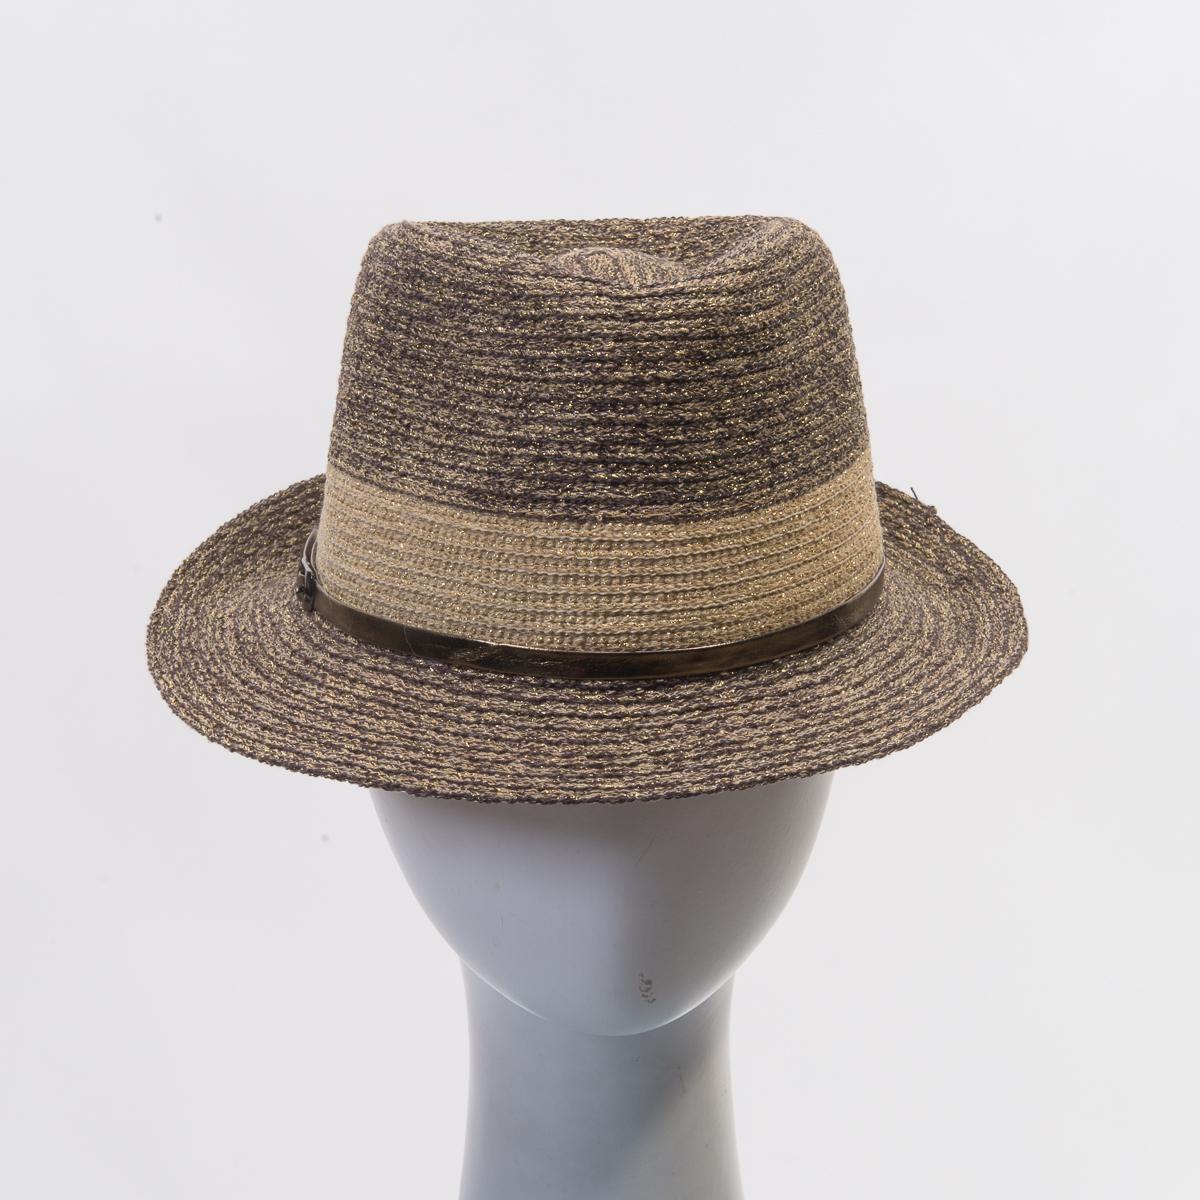 83e4ad6844a1 Brown /Beige Gold Metallic Leather Band Cotton Blend Fedora Hats-FI1608-BN.  GD- Sun Yorkos   KaKyCo Accessories